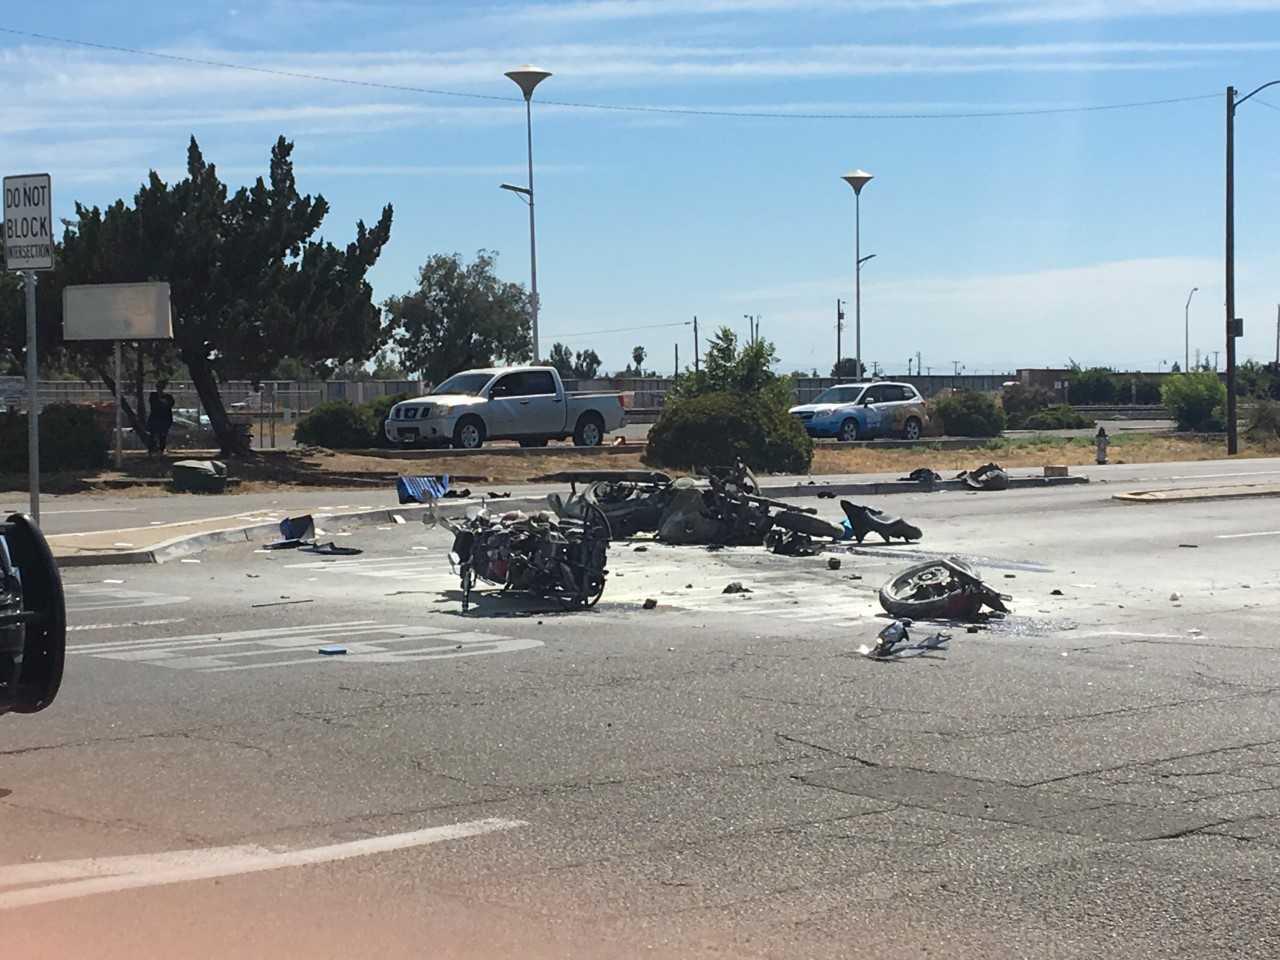 Motorcycle crash in Fresno kills one, critically injures